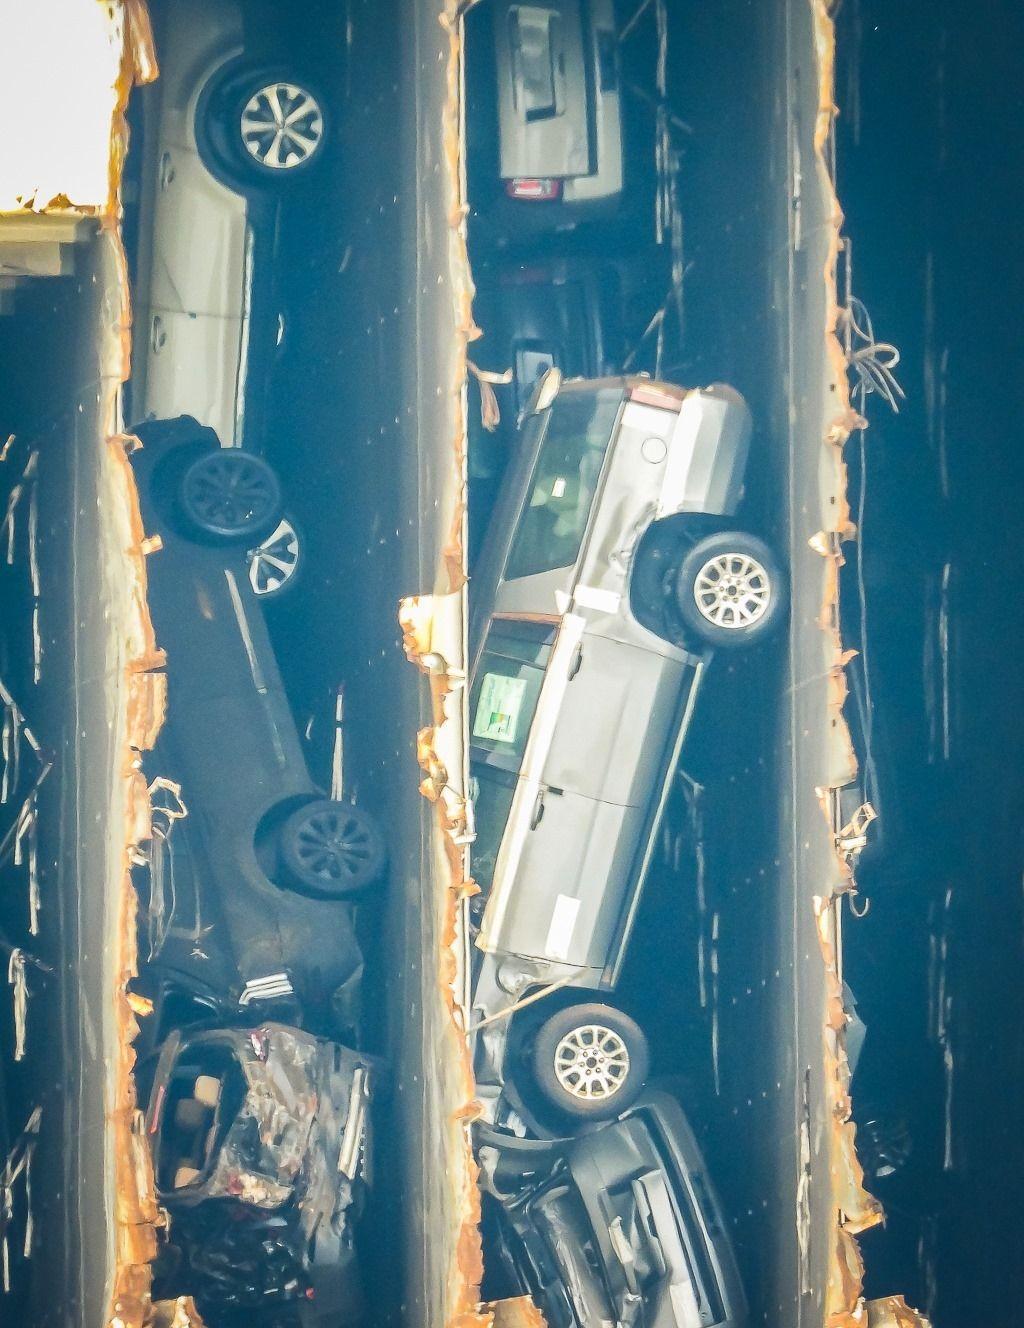 4 000 новых автомобилей Hyundai и Kia режут на металл (фото) 3